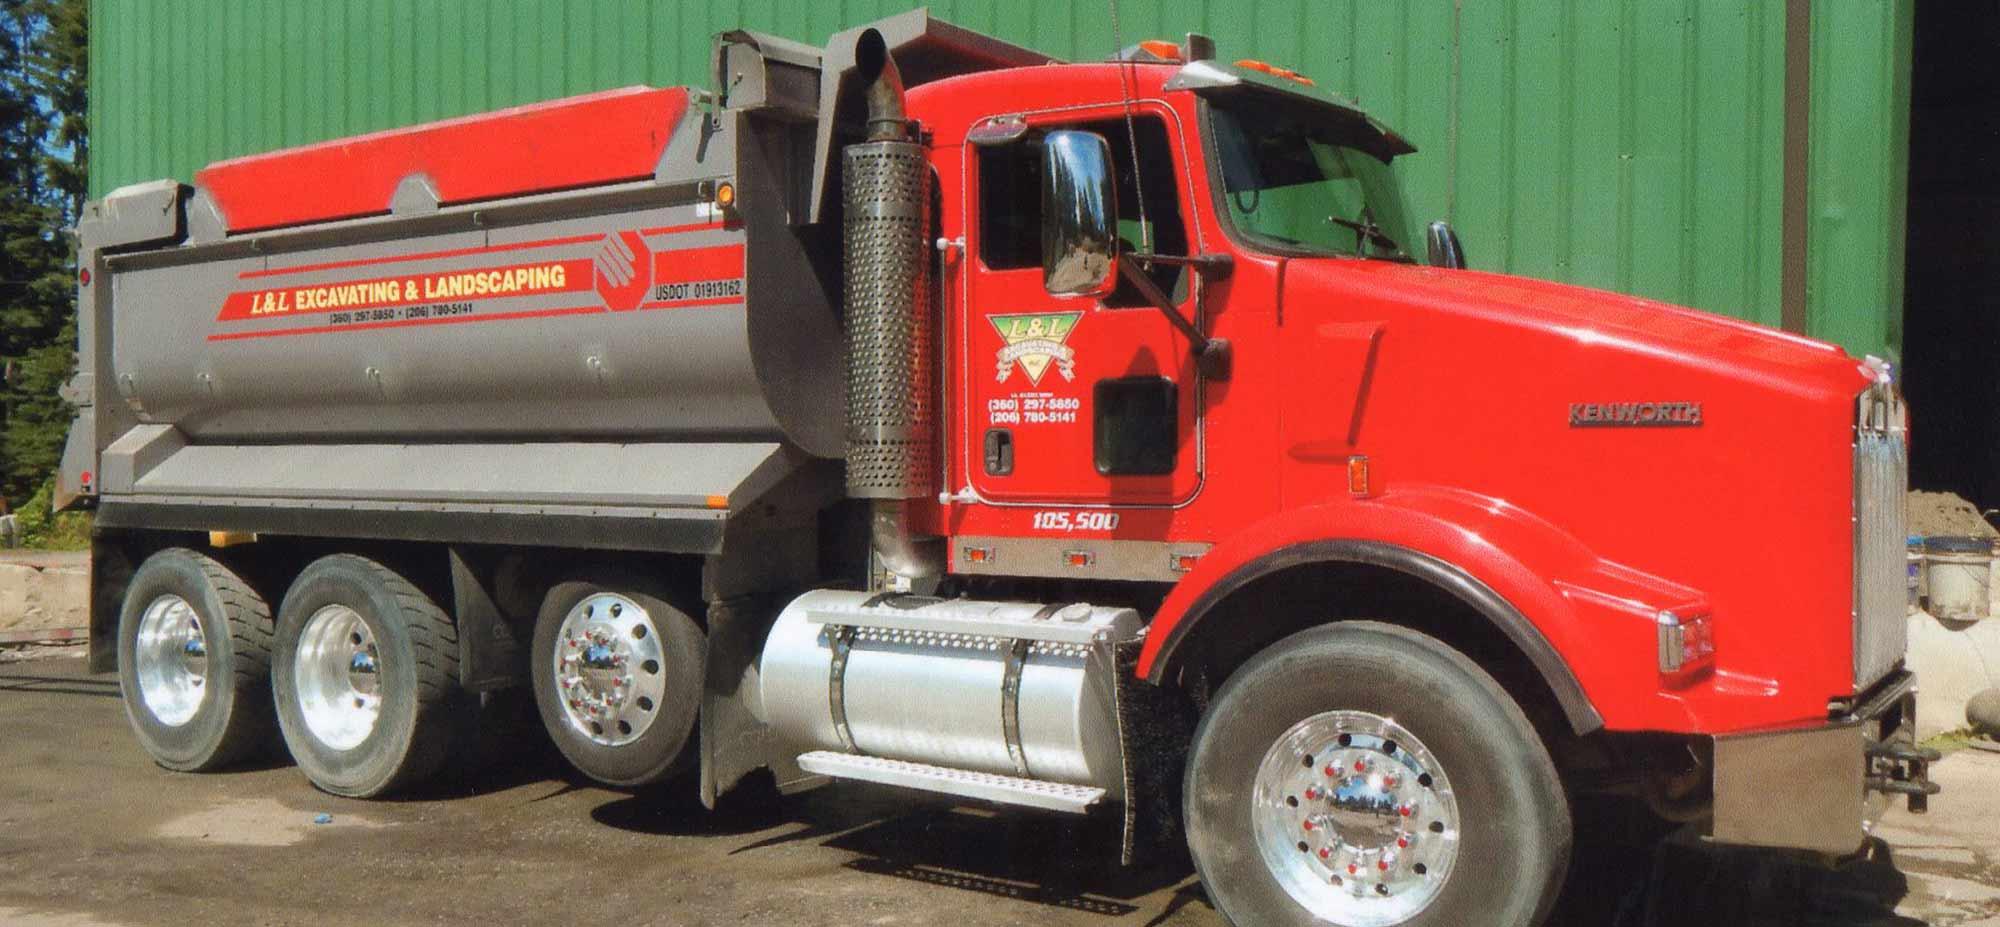 L & L Excavating & Landscaping Truck